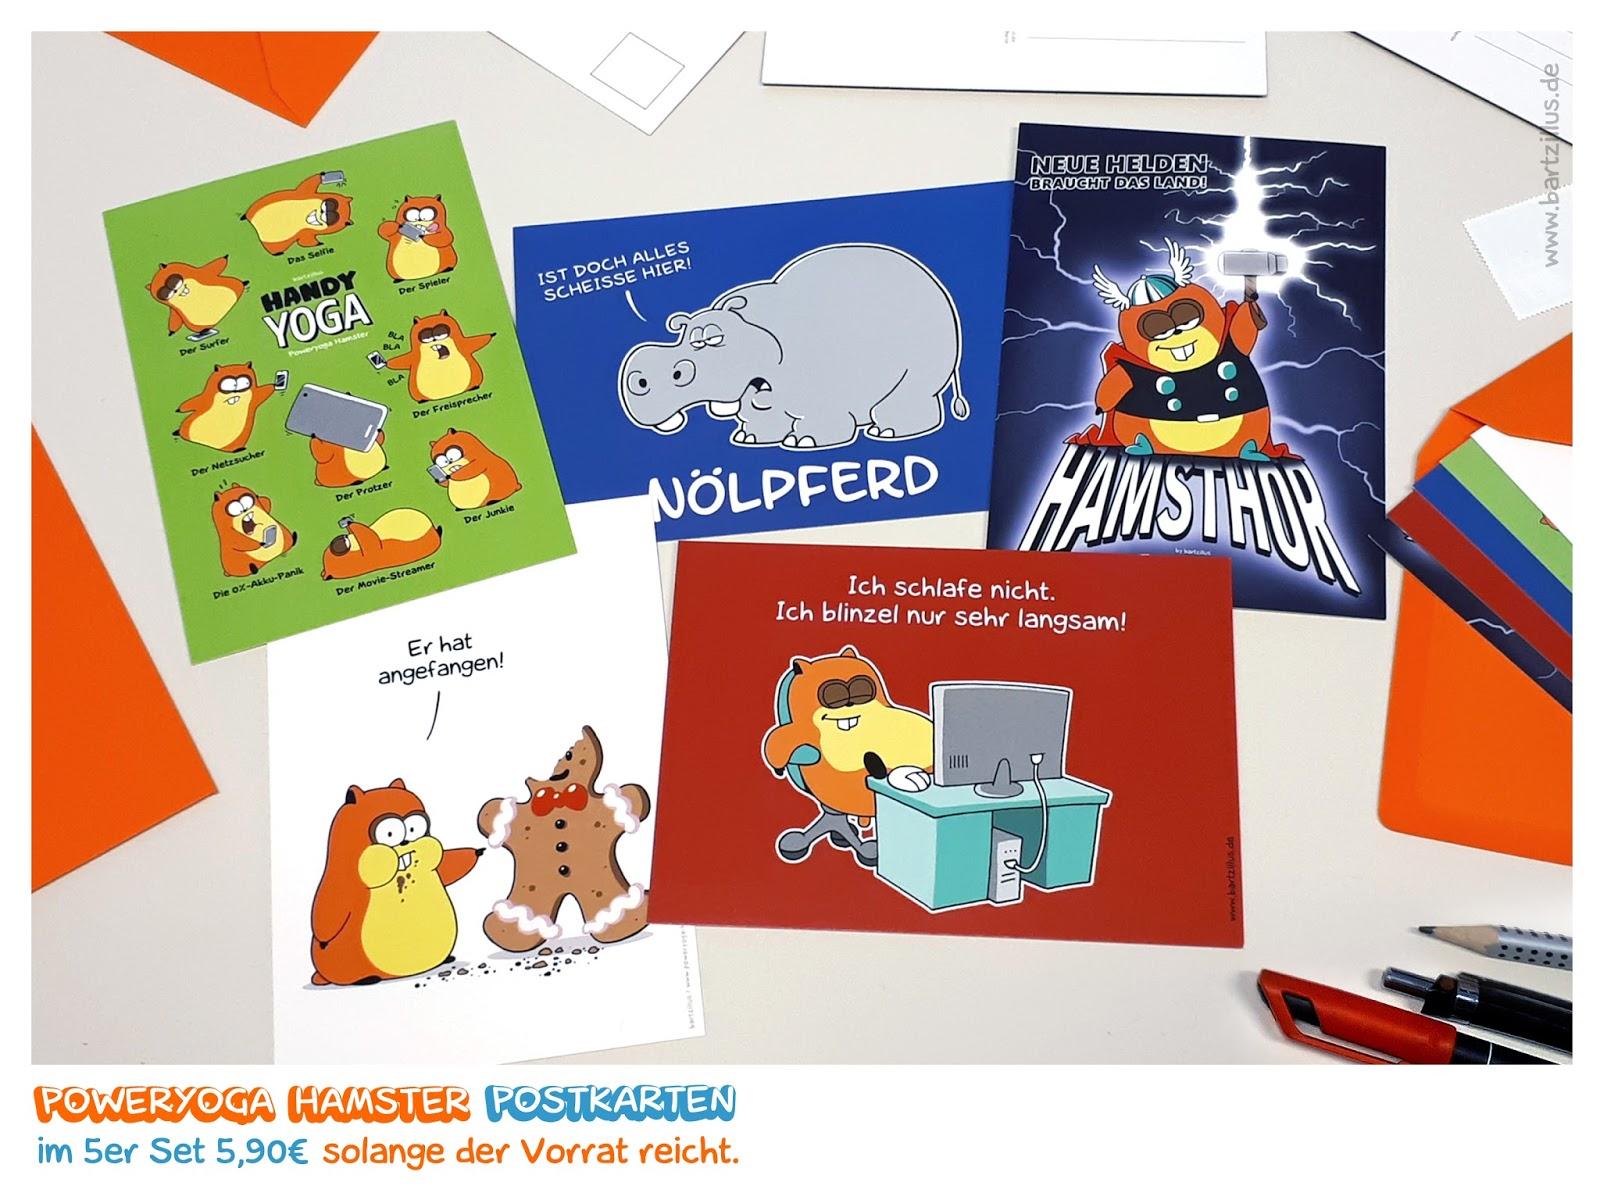 Paypal Karte Bestellen.Poweryoga Hamster Postkarten